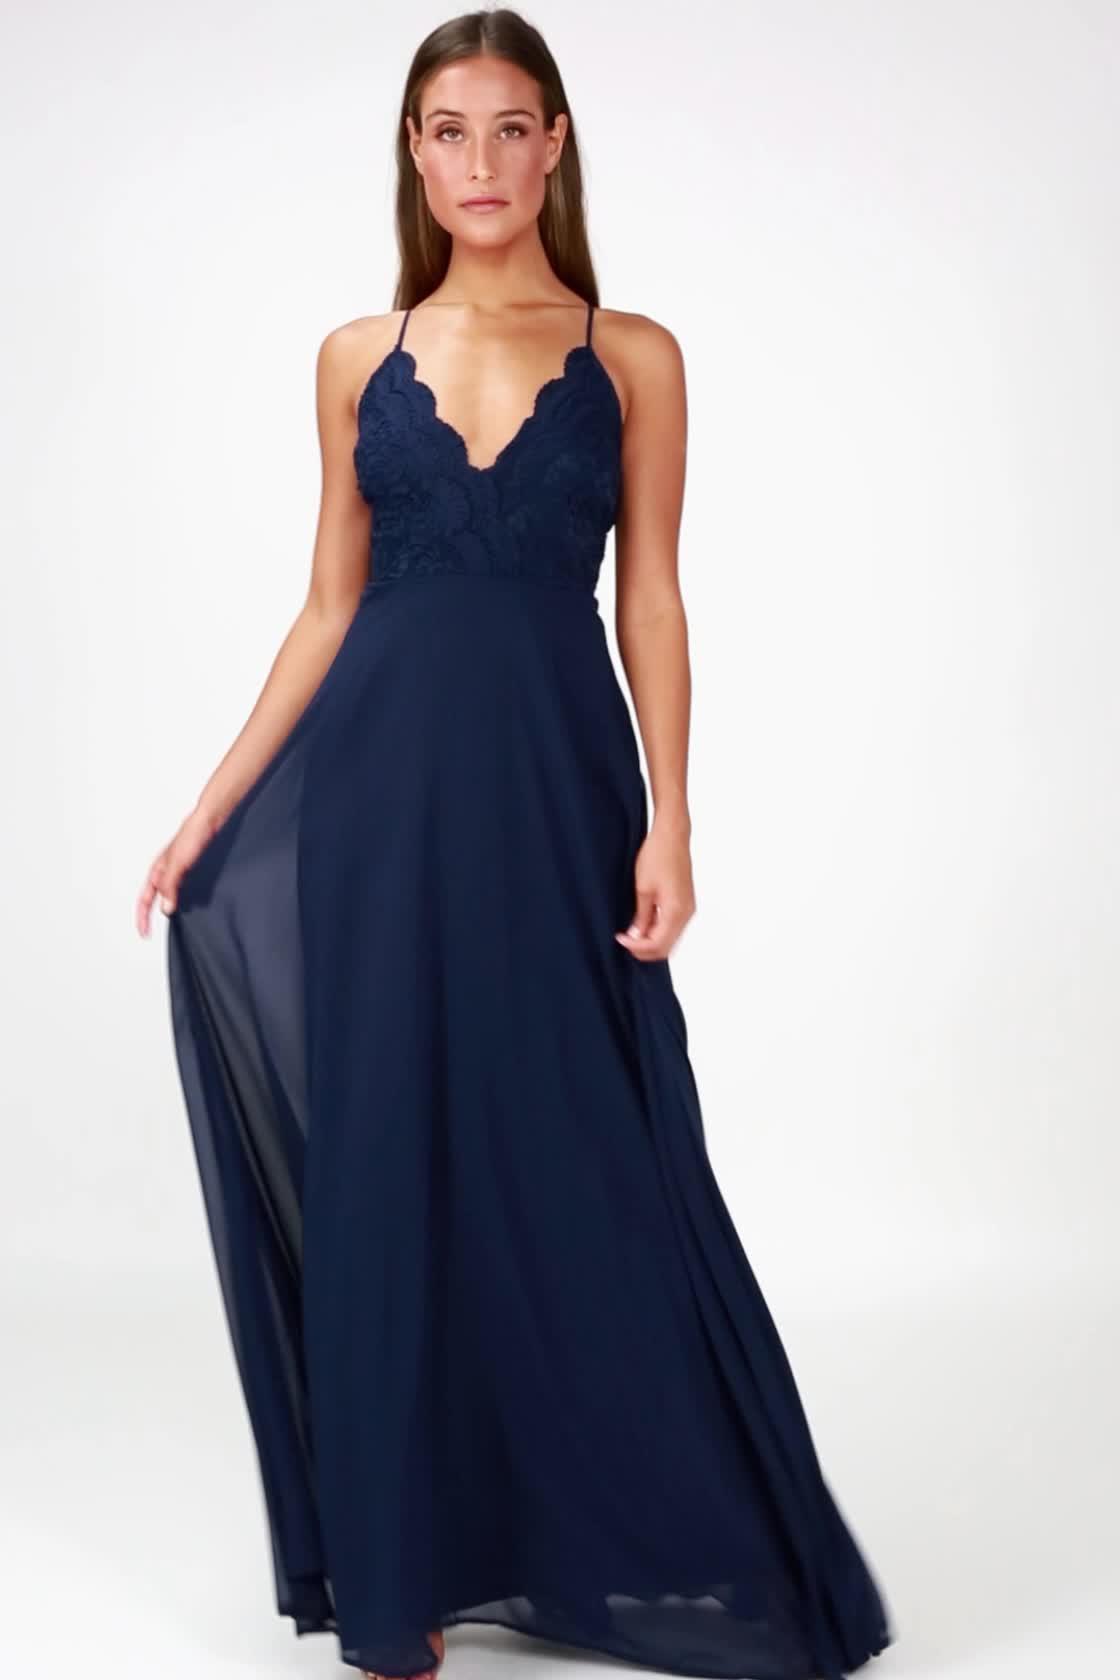 f20143cb650a Pretty Burgundy Maxi Dress - Lace Maxi Dress - Bridesmaids Dress